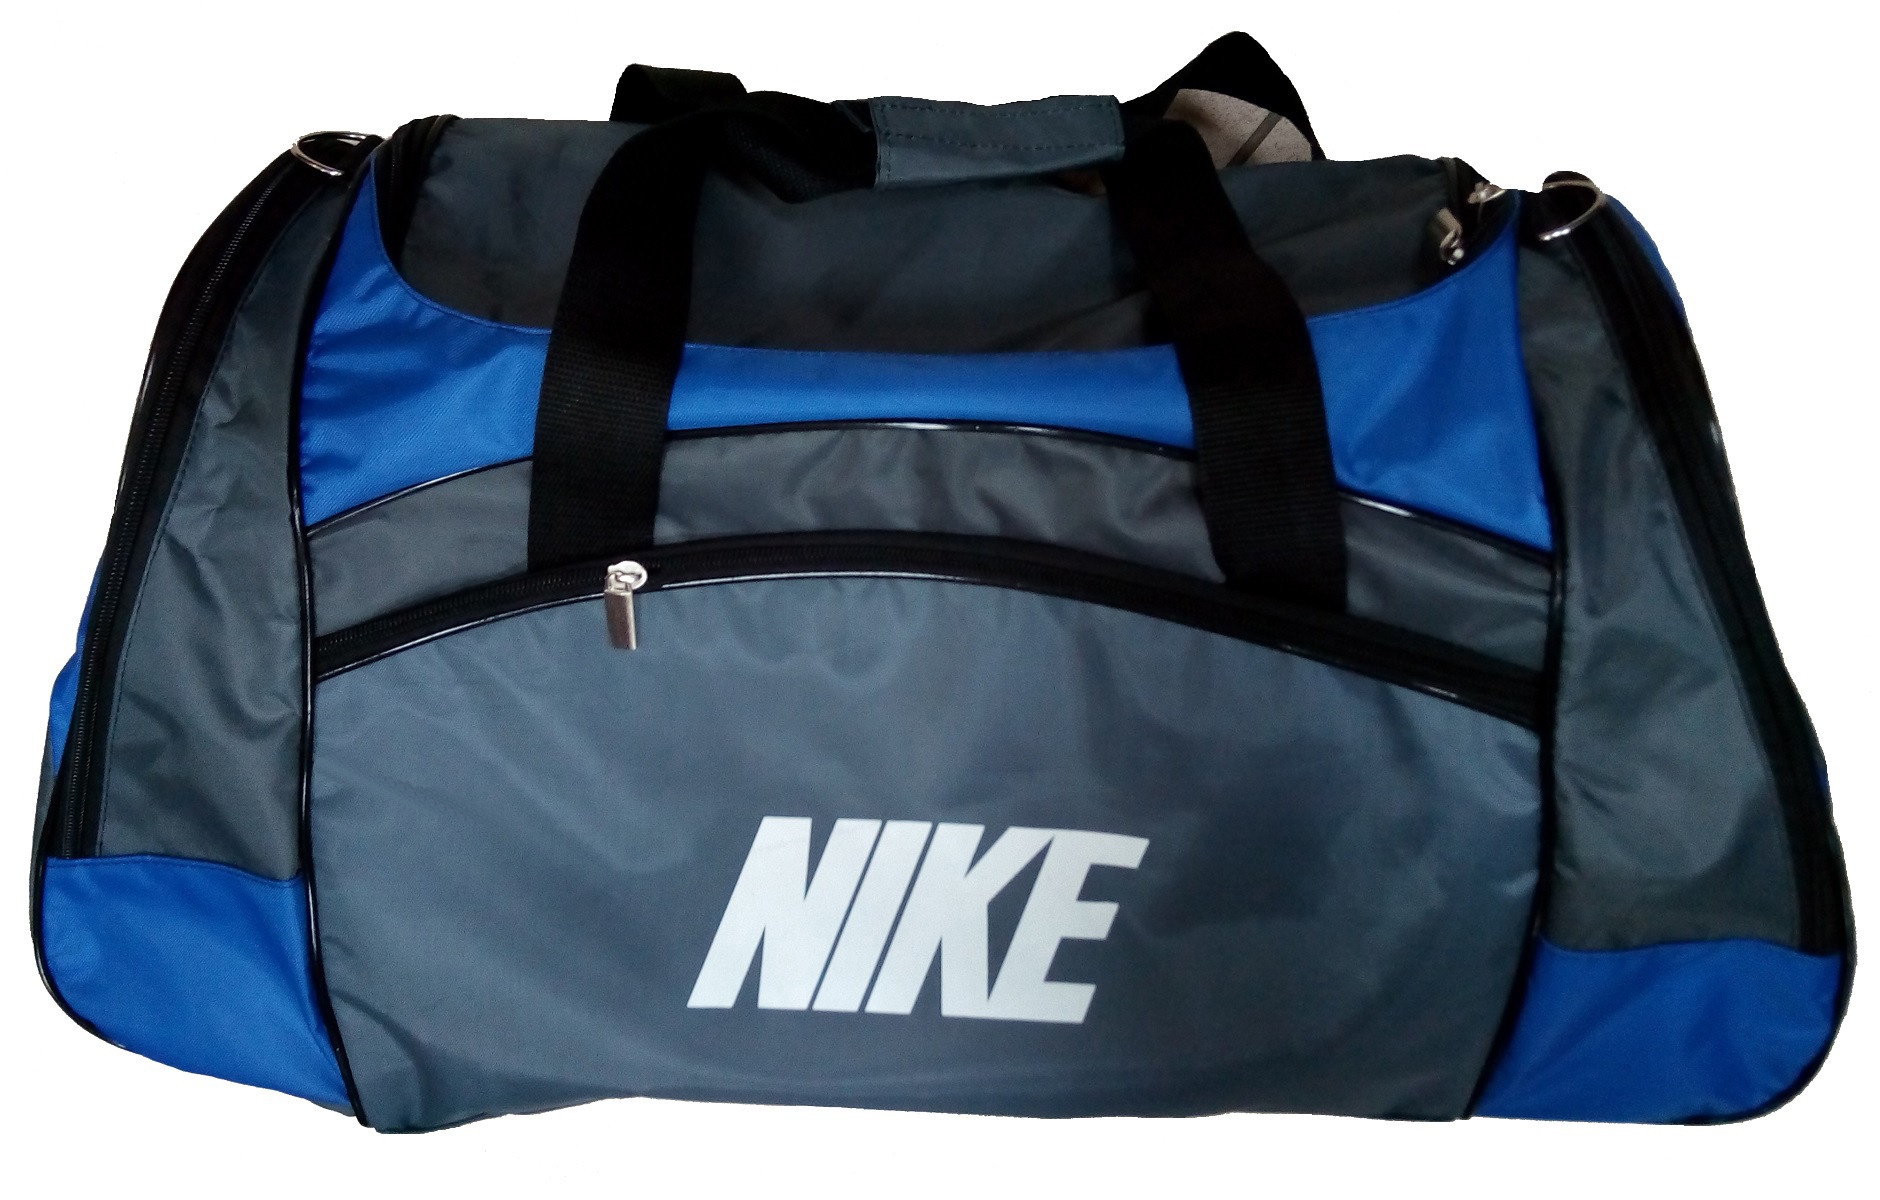 047ab189 Сумка спортивная Nike со скошенными карманами средняя серо-синяя 56 см -  Travel Bag